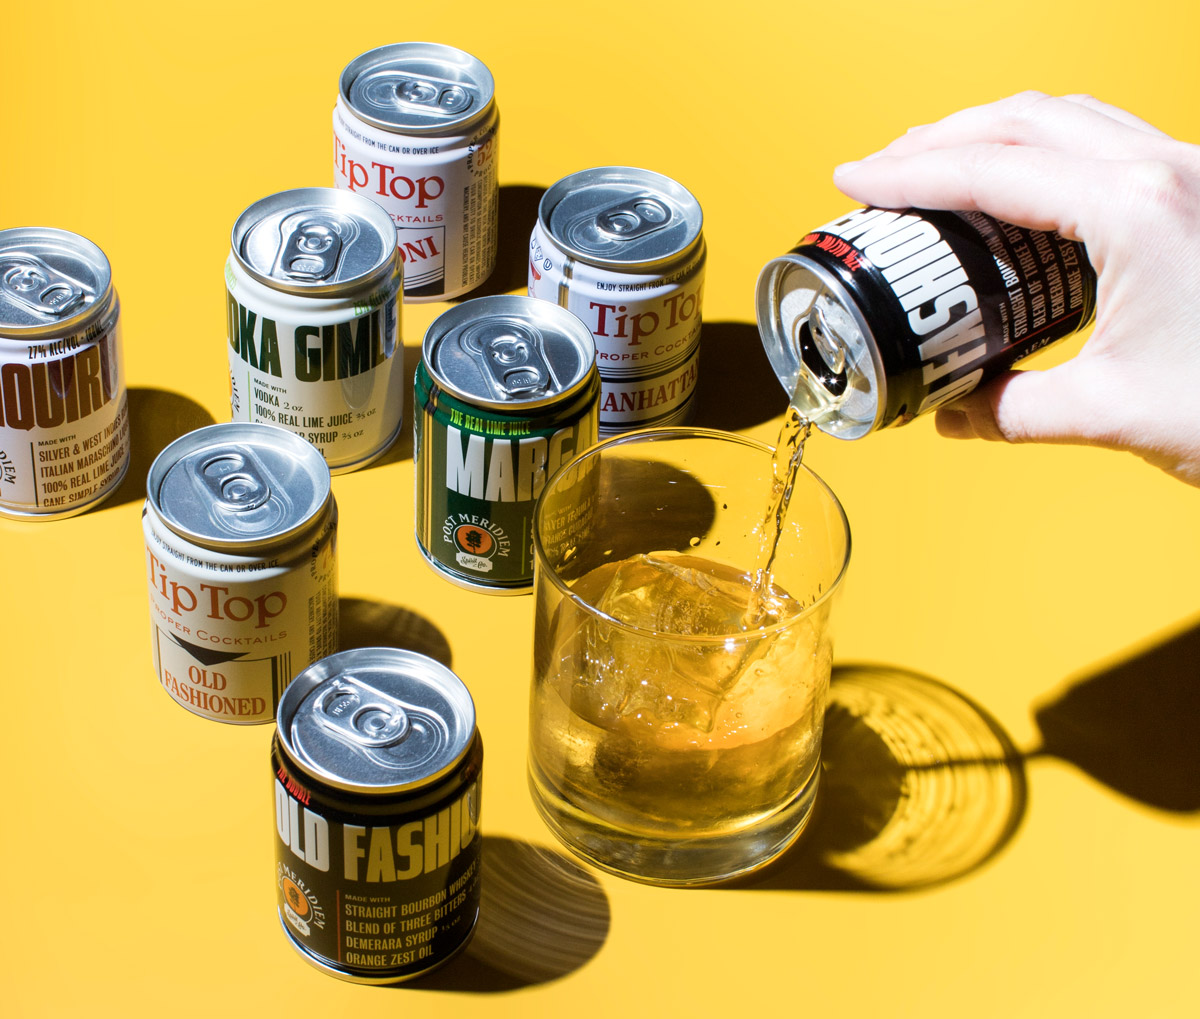 Atlanta canned cocktails